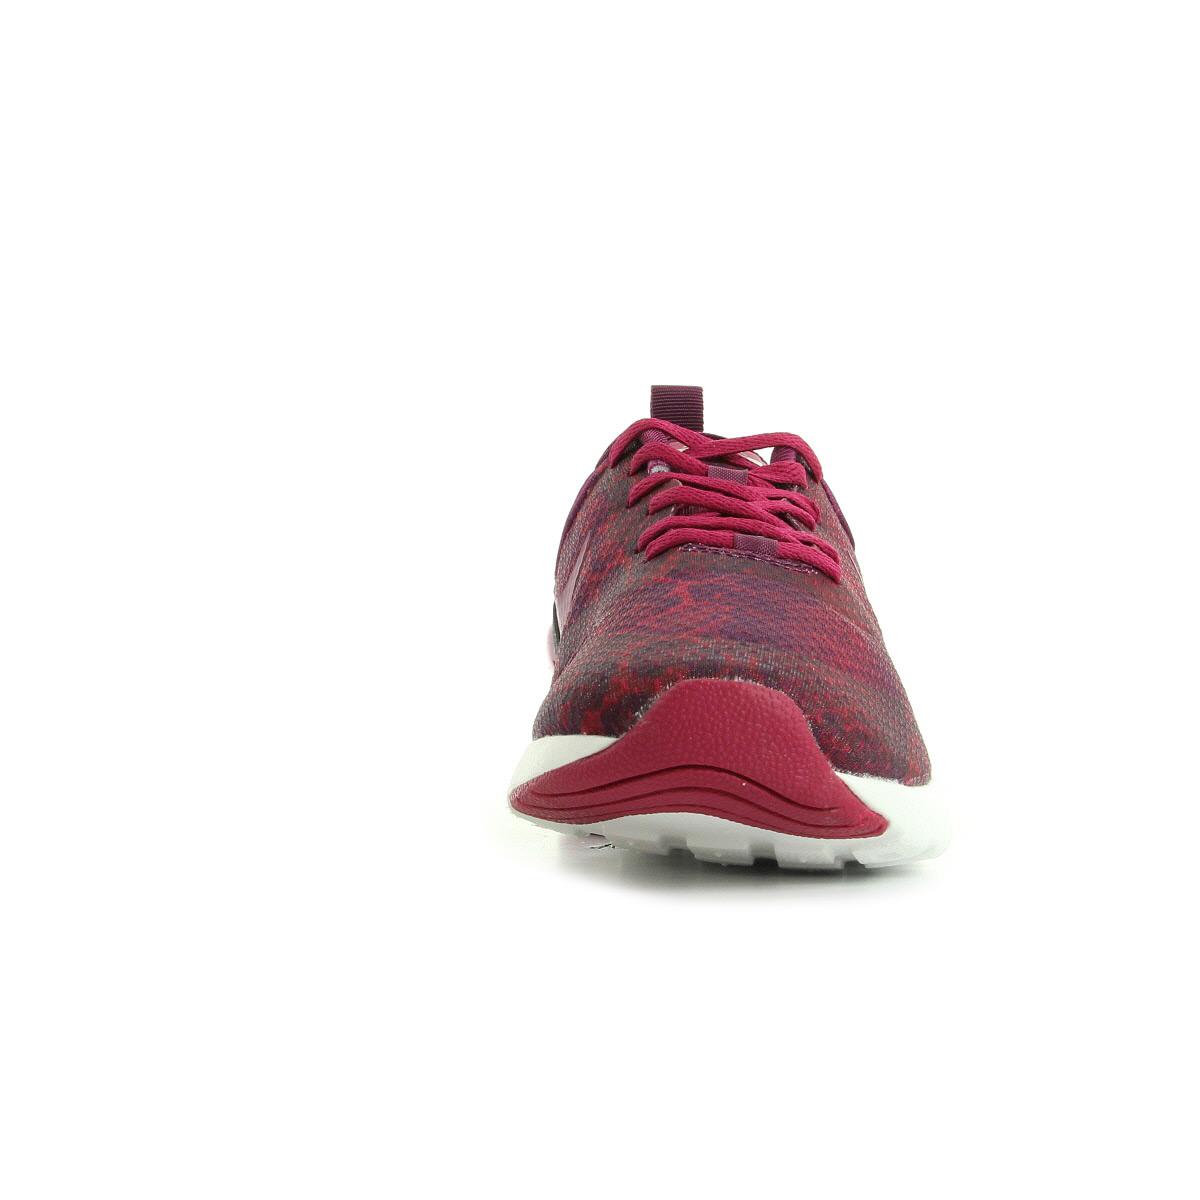 Nike Air Max Siren Print Dernières 749511600 Baskets mode femme Dernières Print d7835a